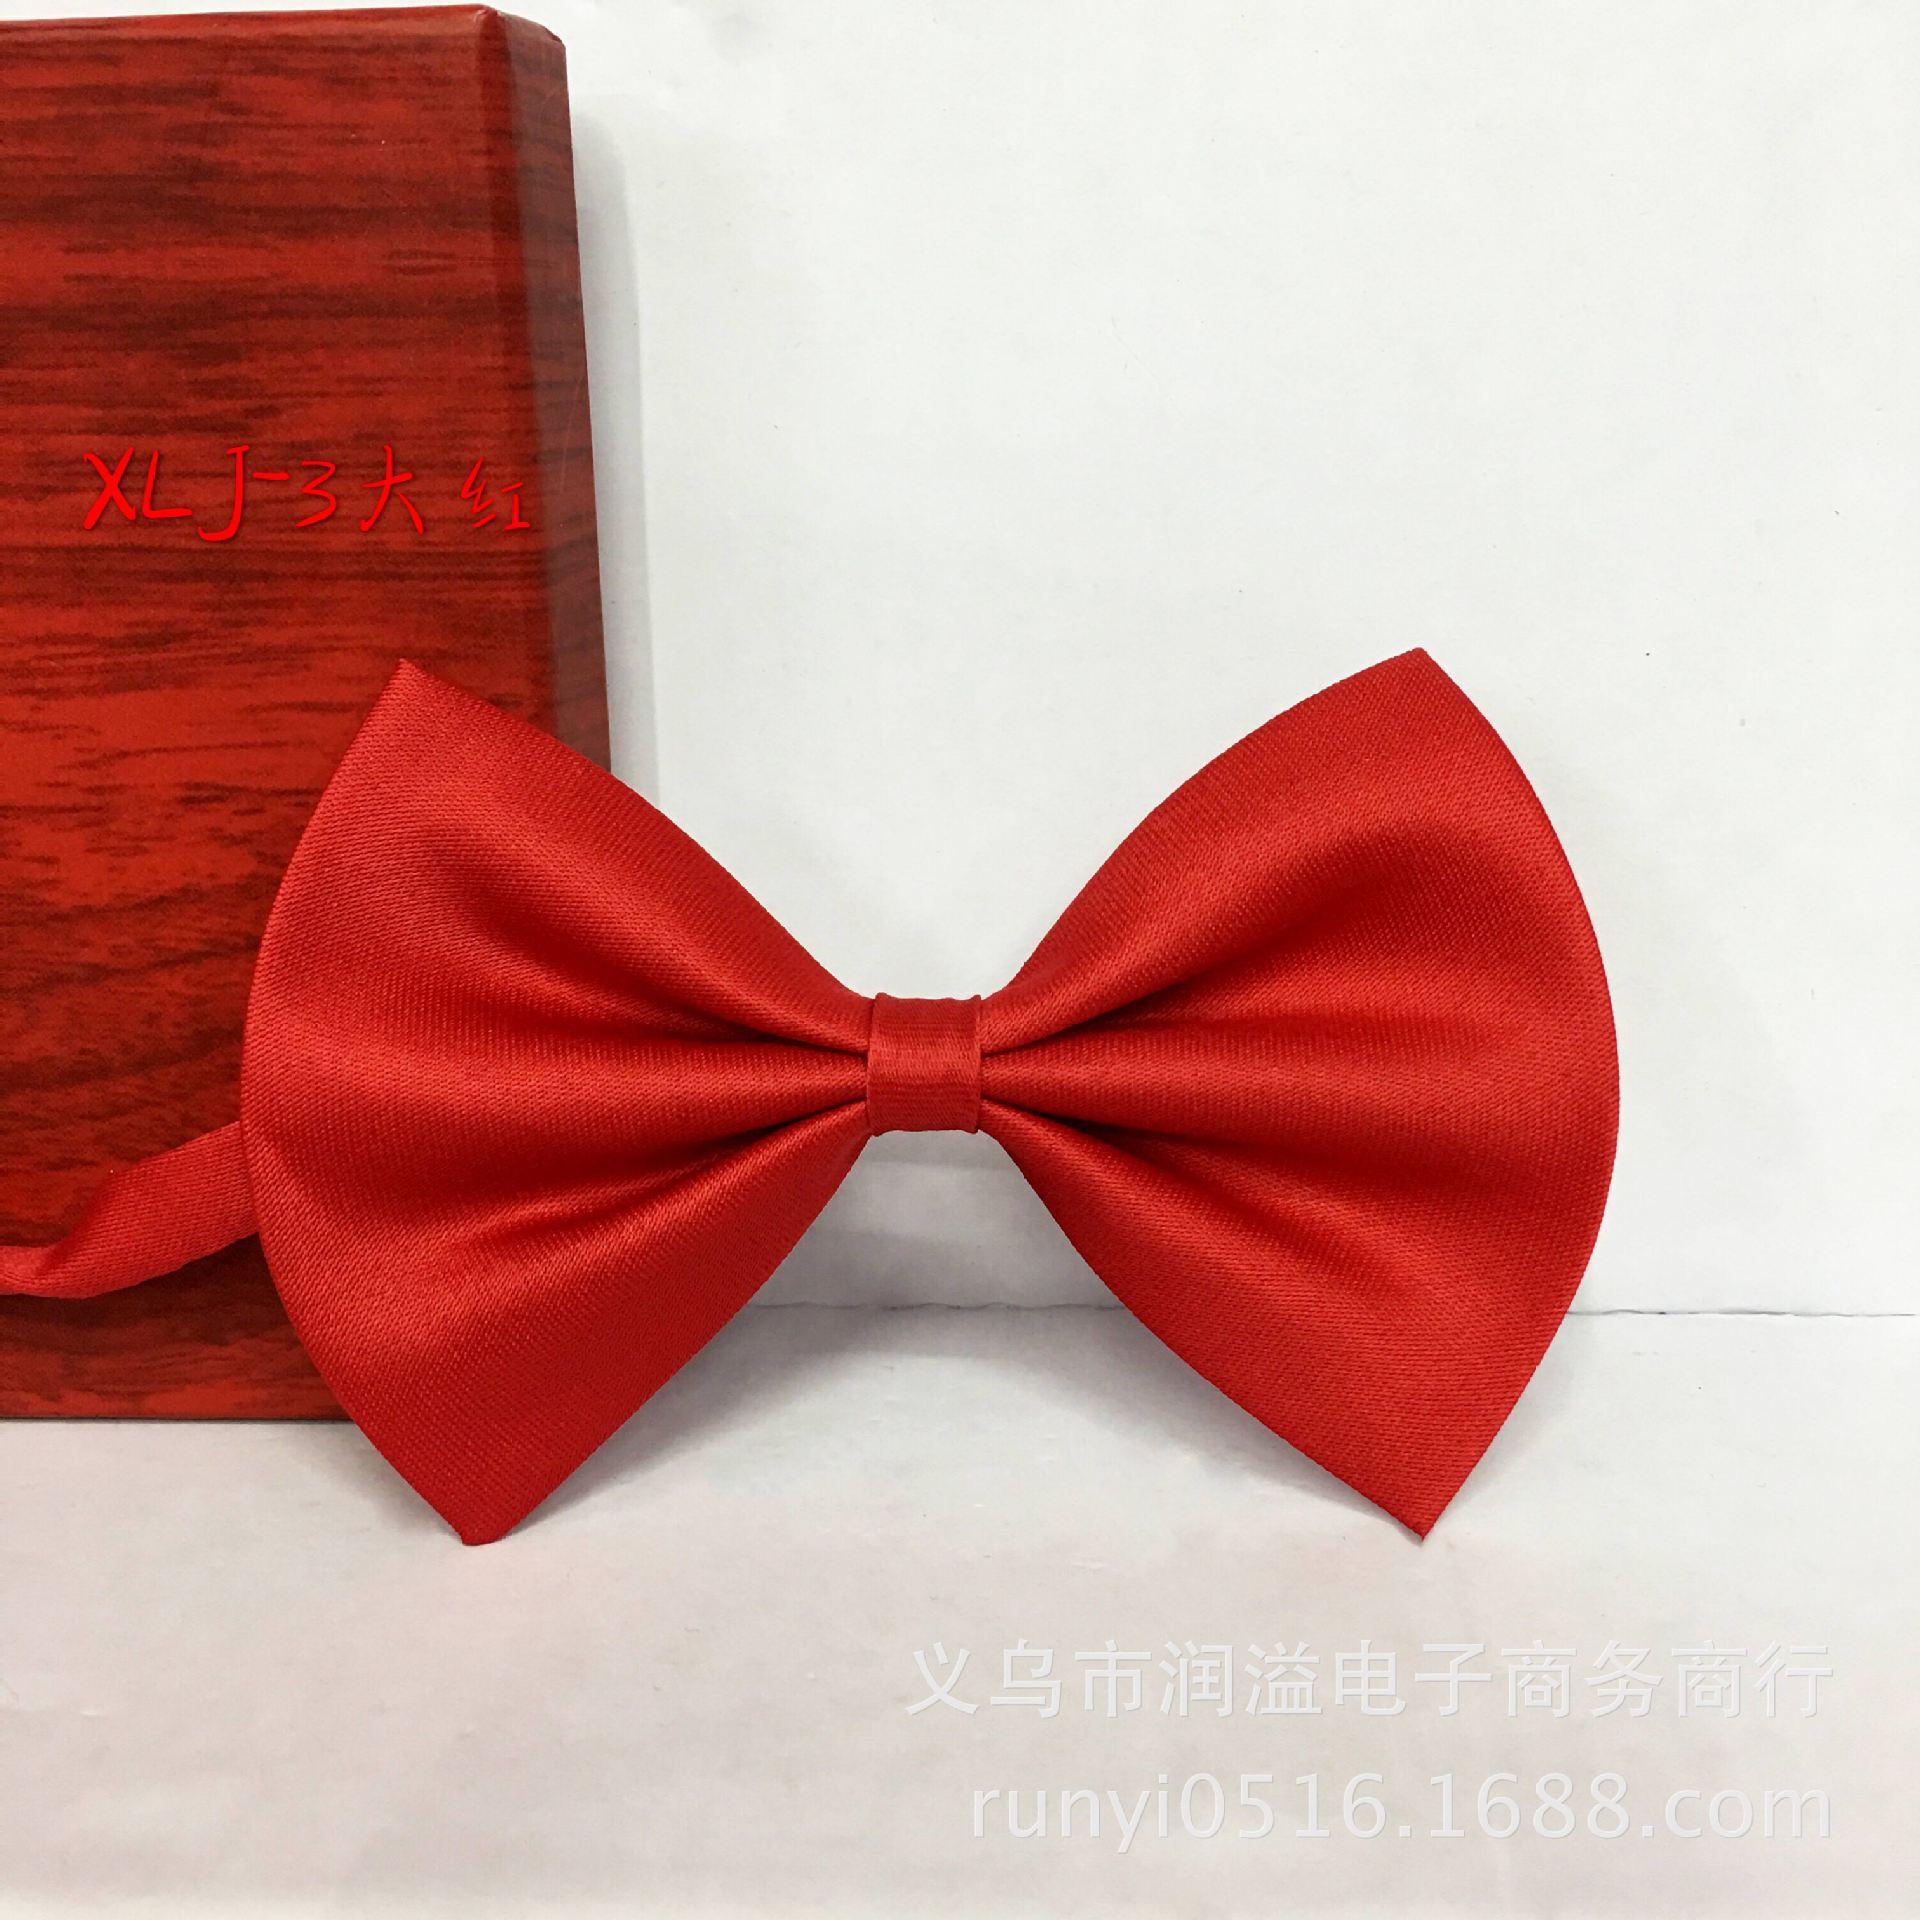 Bow Tie Bowtie Multi-color Children Bowtie Satin Korean-style Bow Gentleman Set Accessories